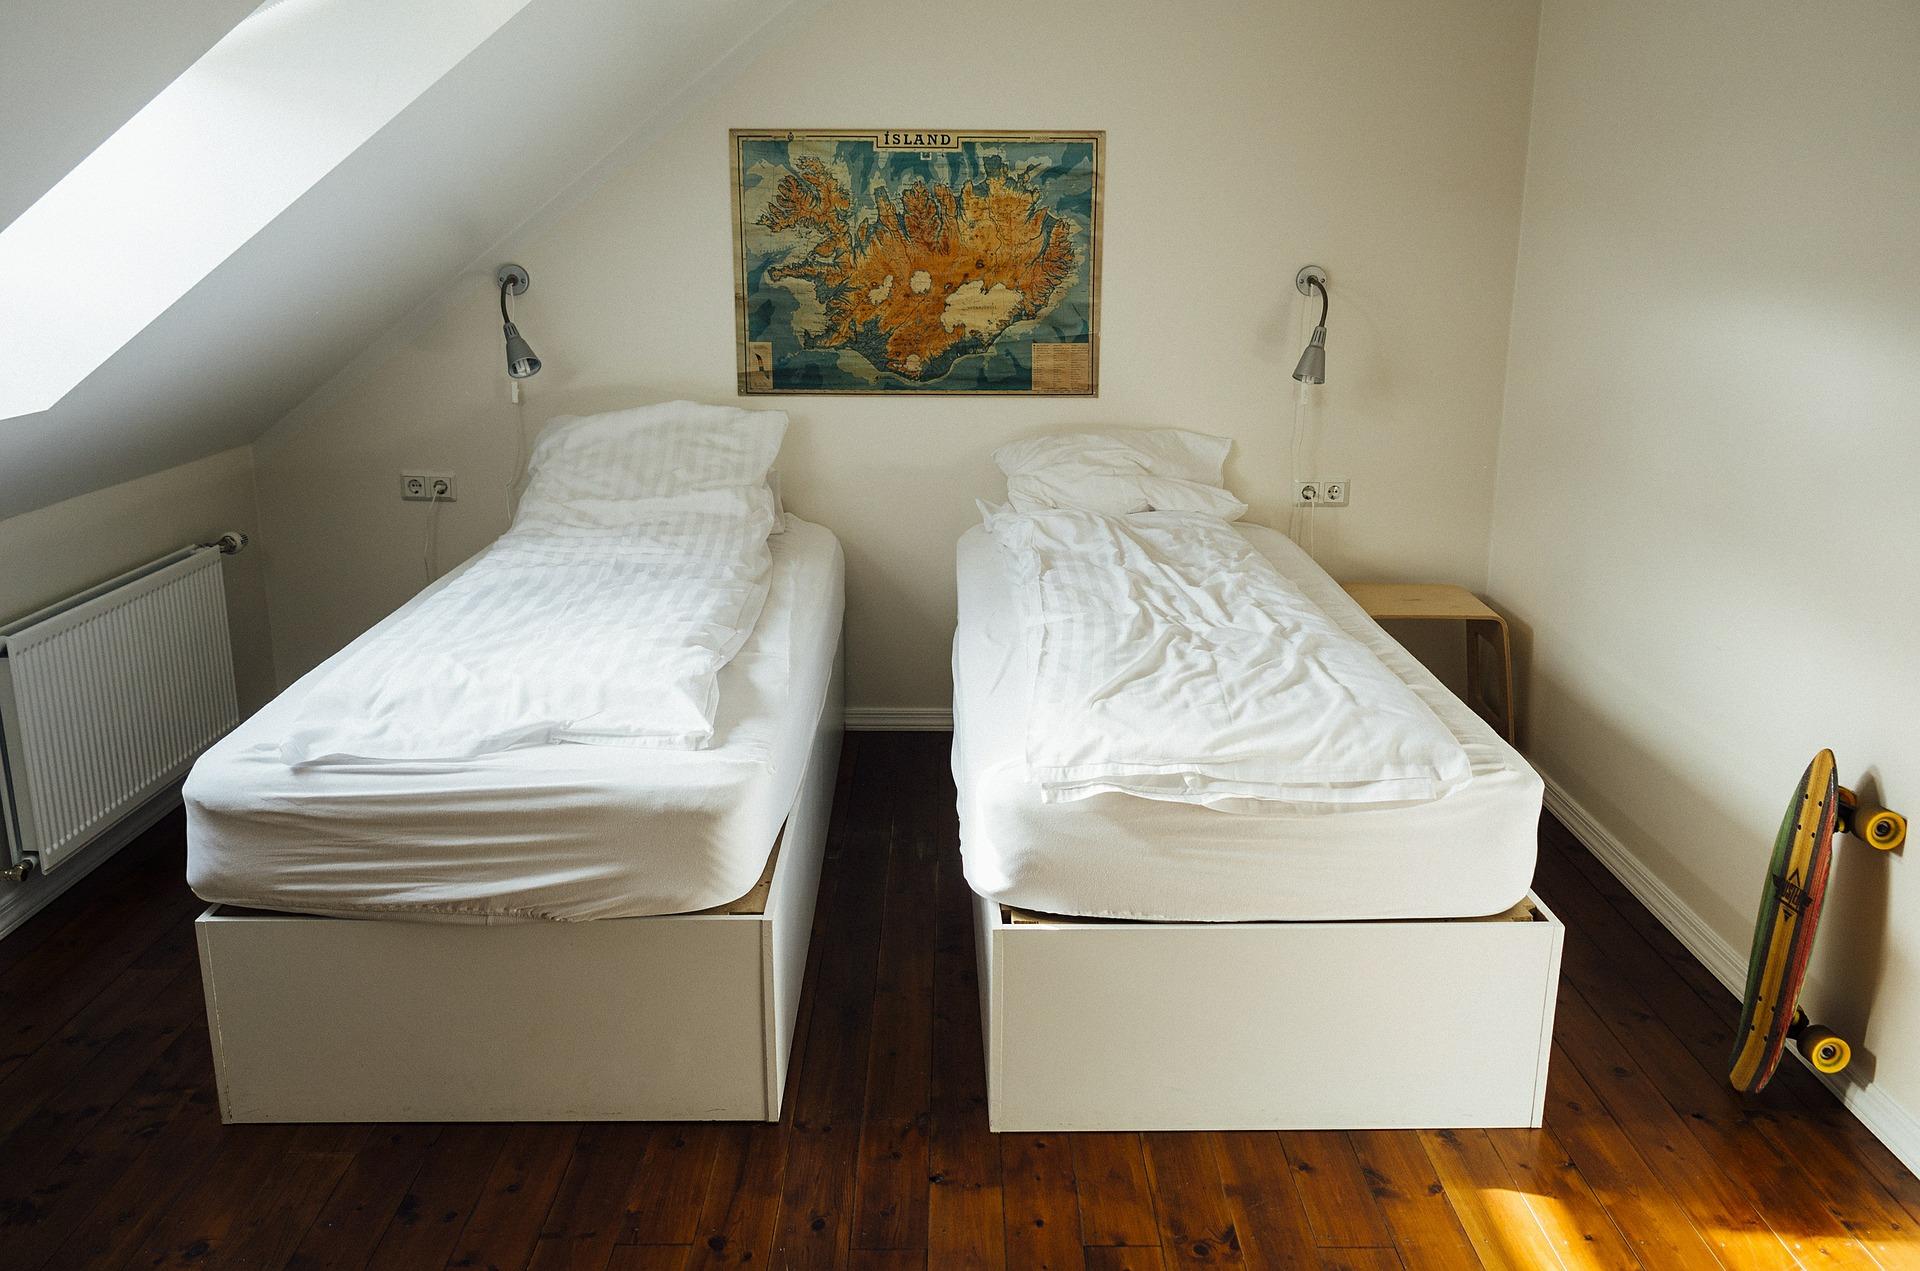 bedroom-413706_1920.jpg